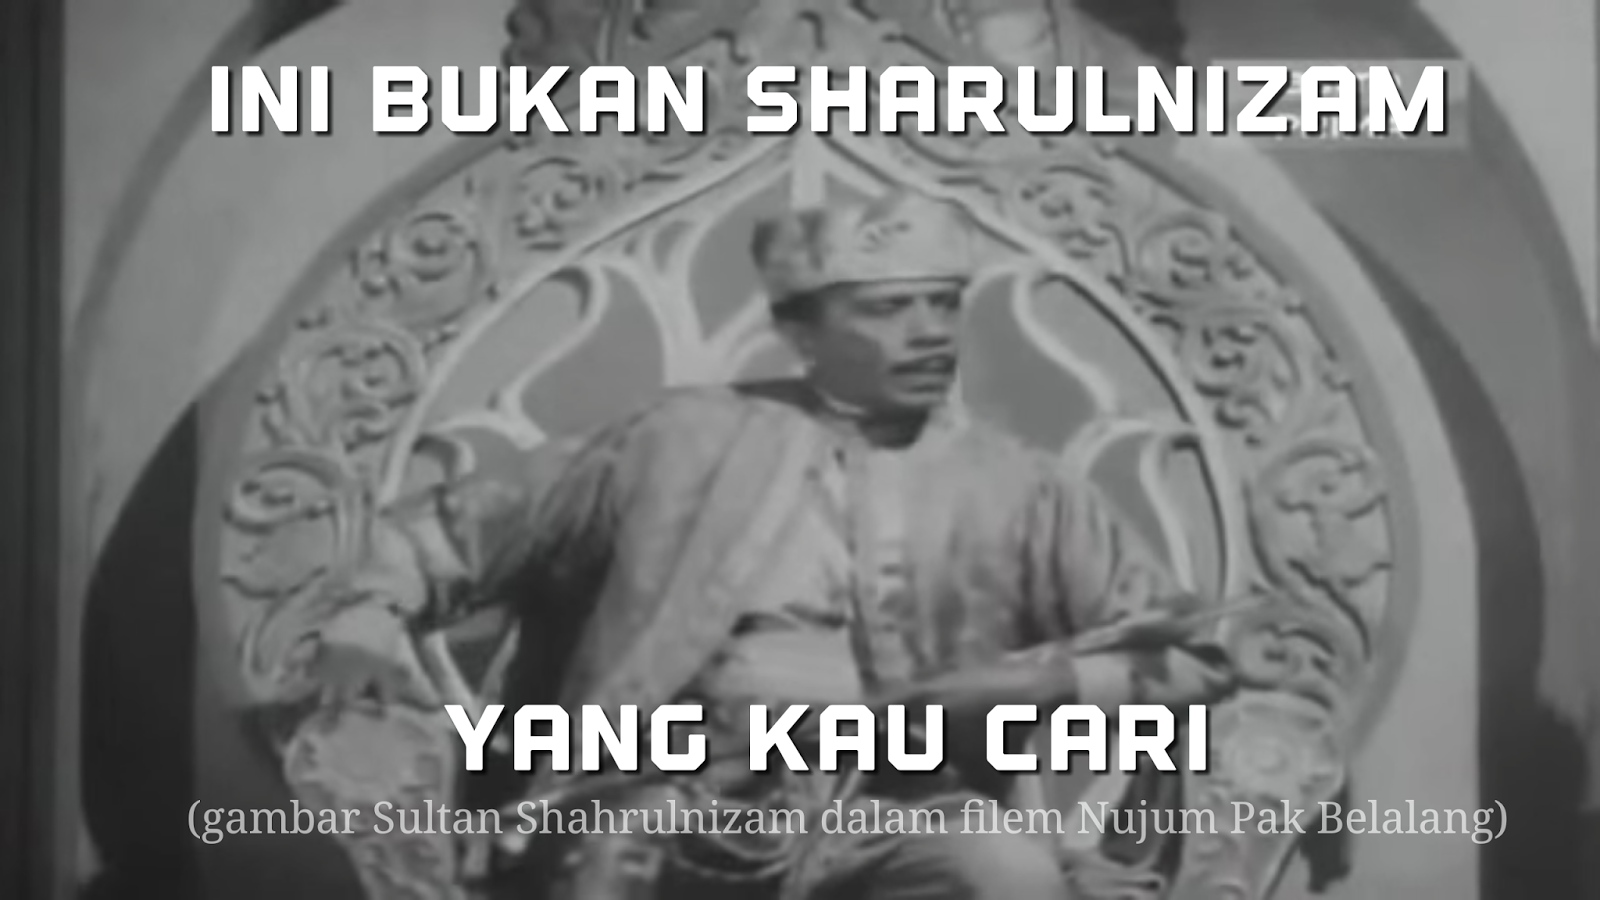 Sultan Shahrulnizam Nujum Pak Belalang